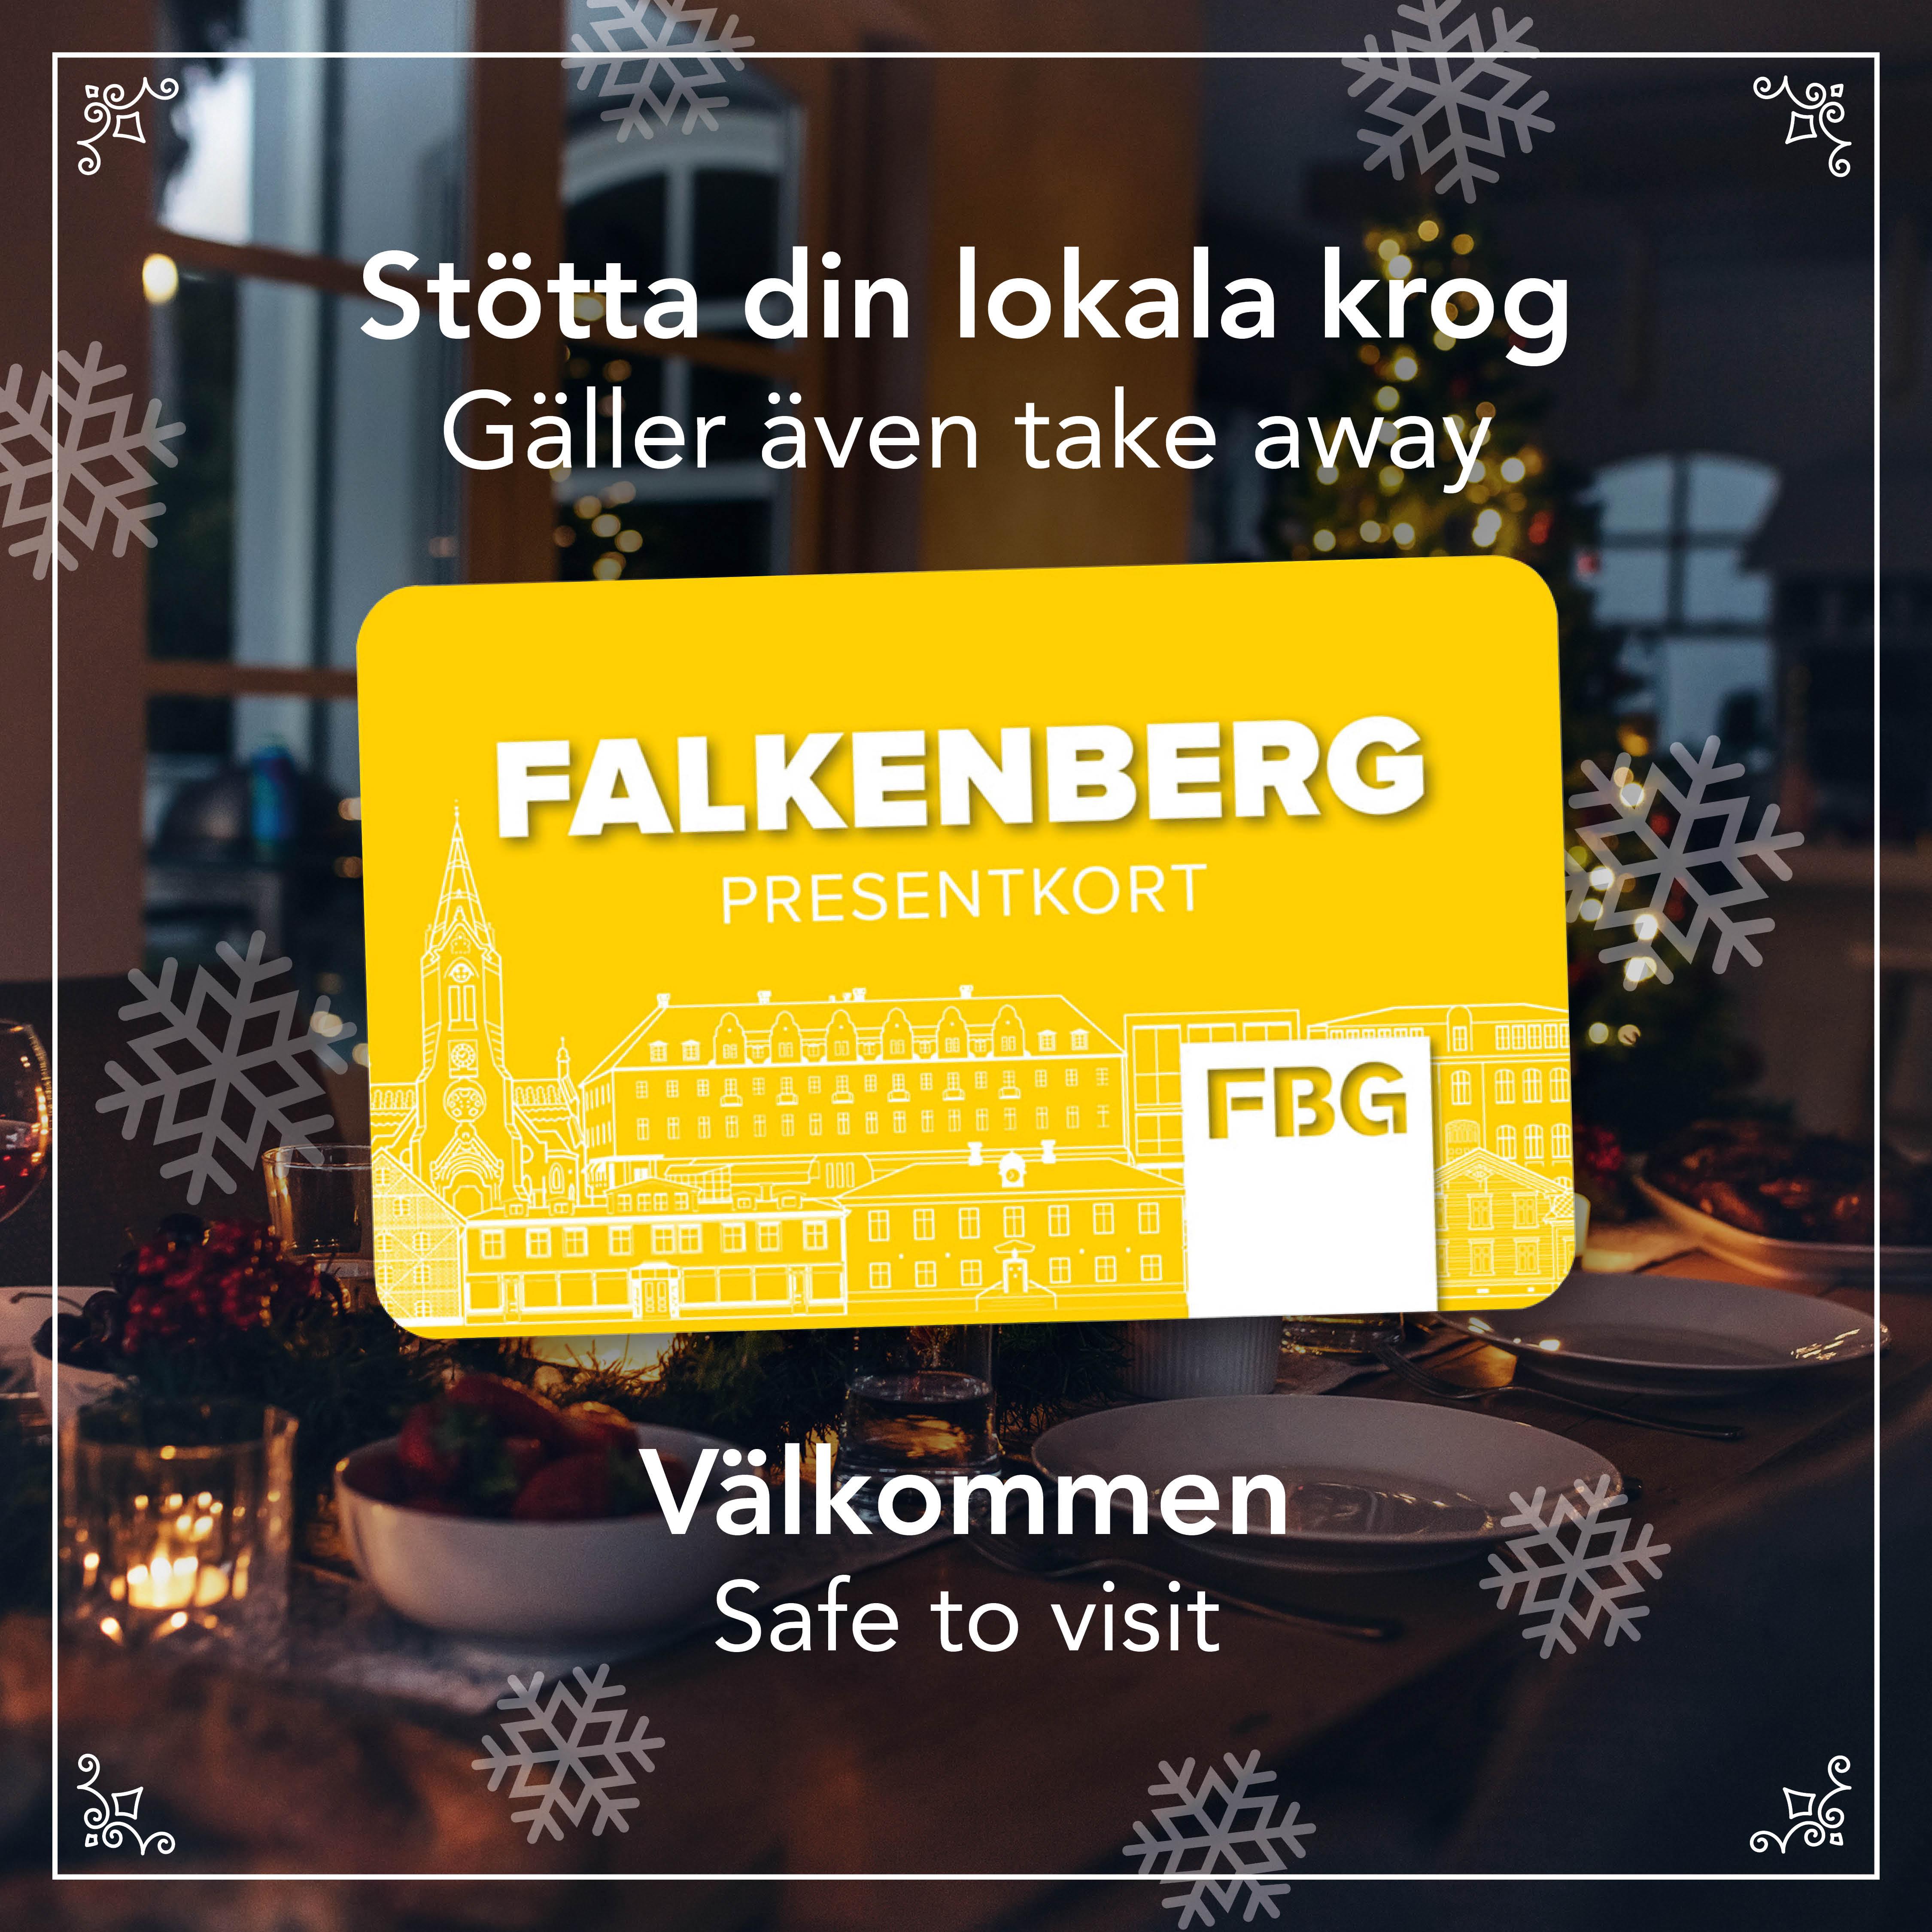 Falkenberg presentkort